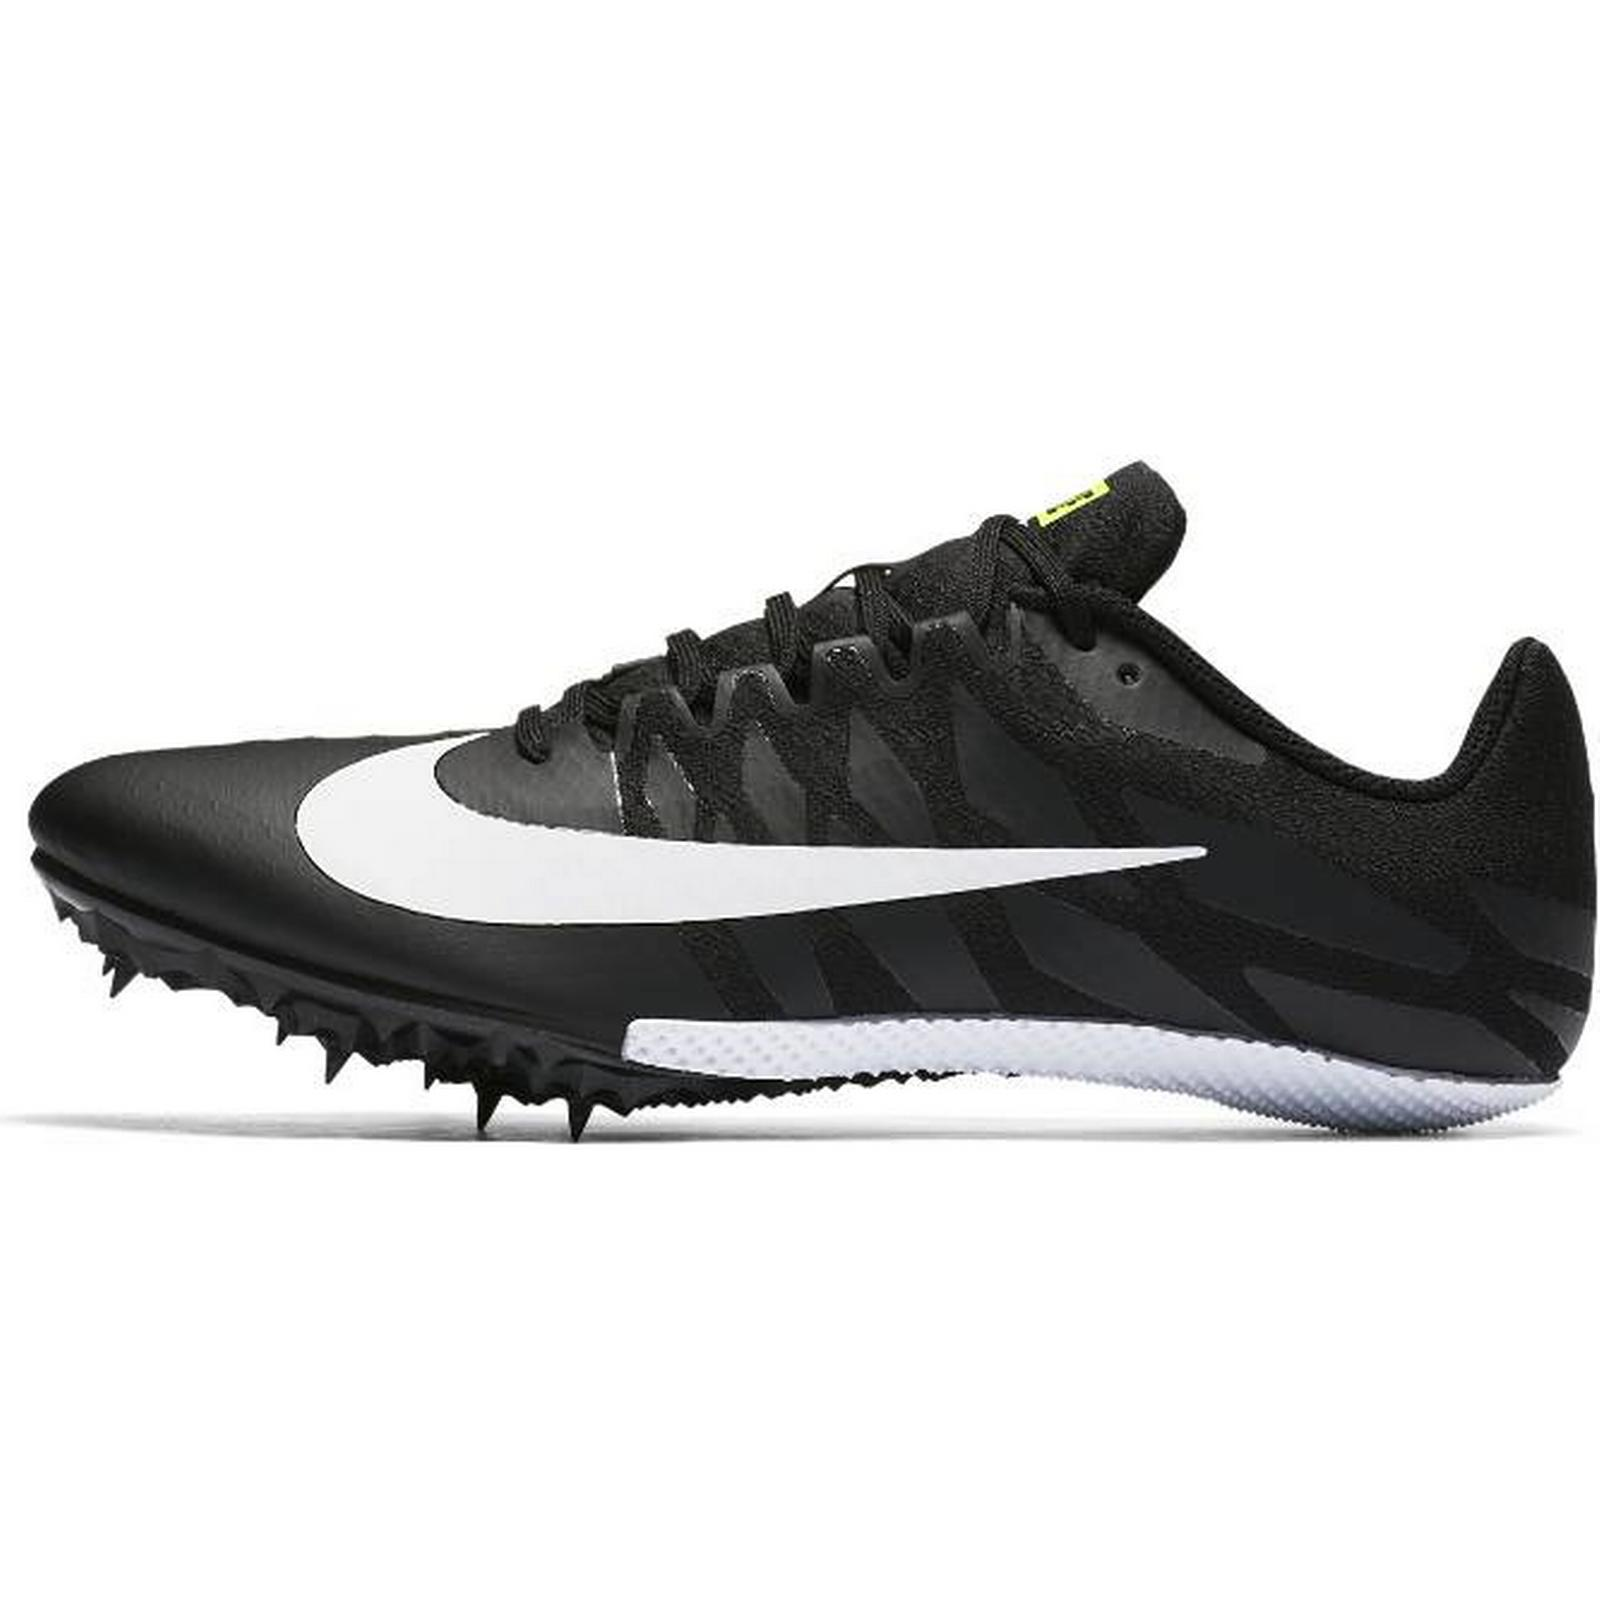 Men's/Women's: NIKE Kolce Uniseks 9: Nike Zoom Rival S 9: Uniseks true 0d2ab3